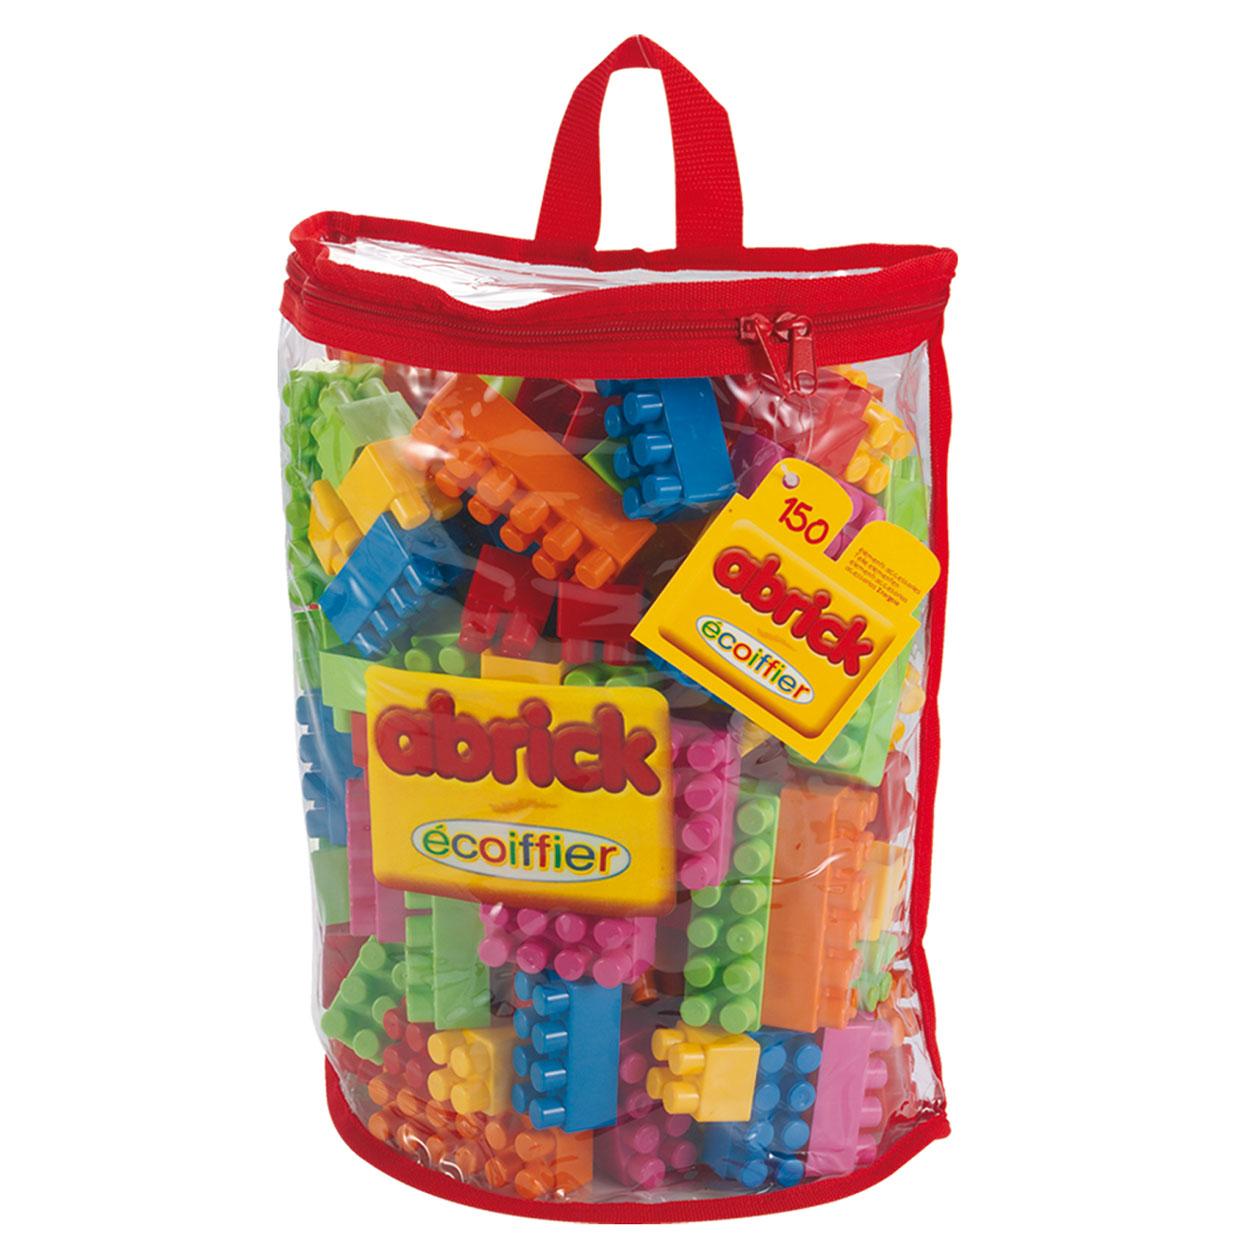 5d0e870e68bec7 Abrick Blokken in Zak Groot online kopen   Lobbes Speelgoed